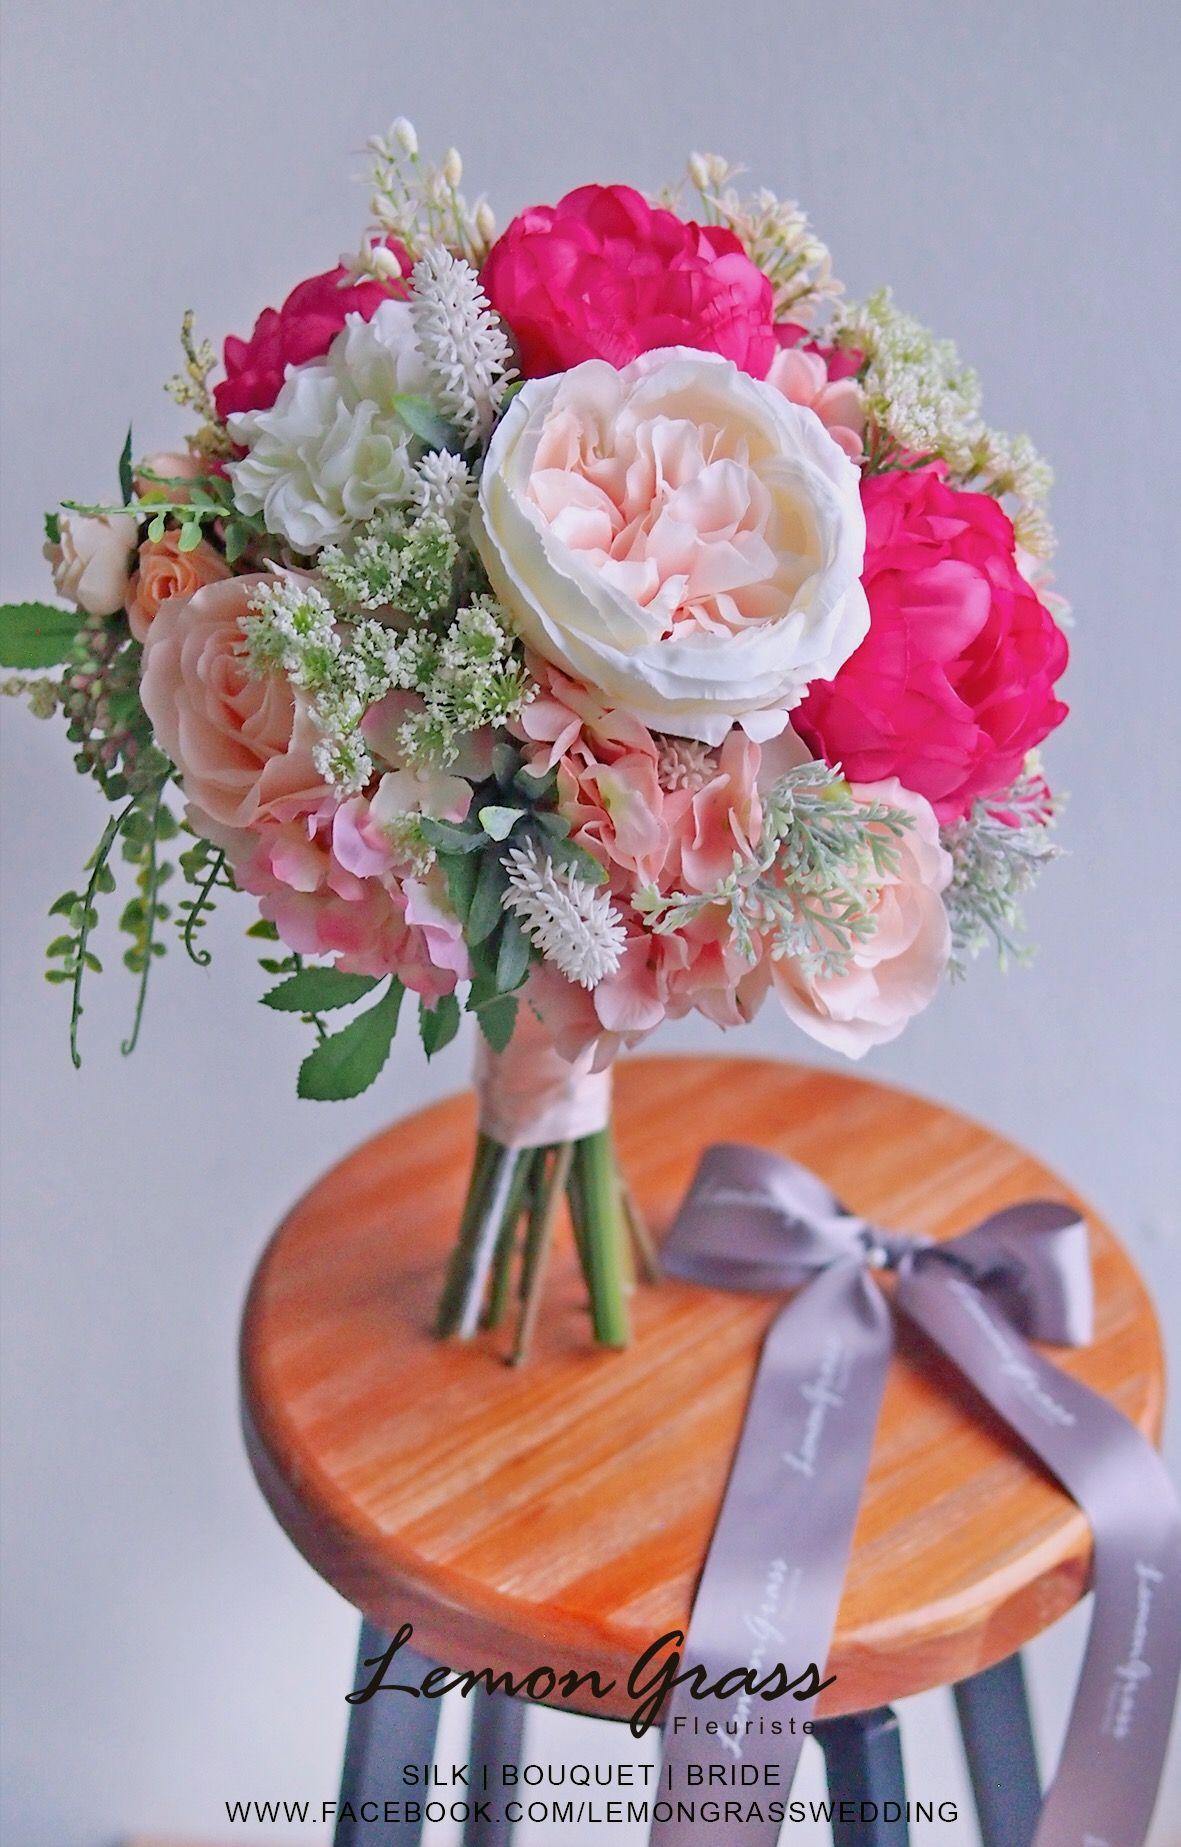 Pin By Mona Chan On Wedding Pinterest Wedding Flowers Bouquet